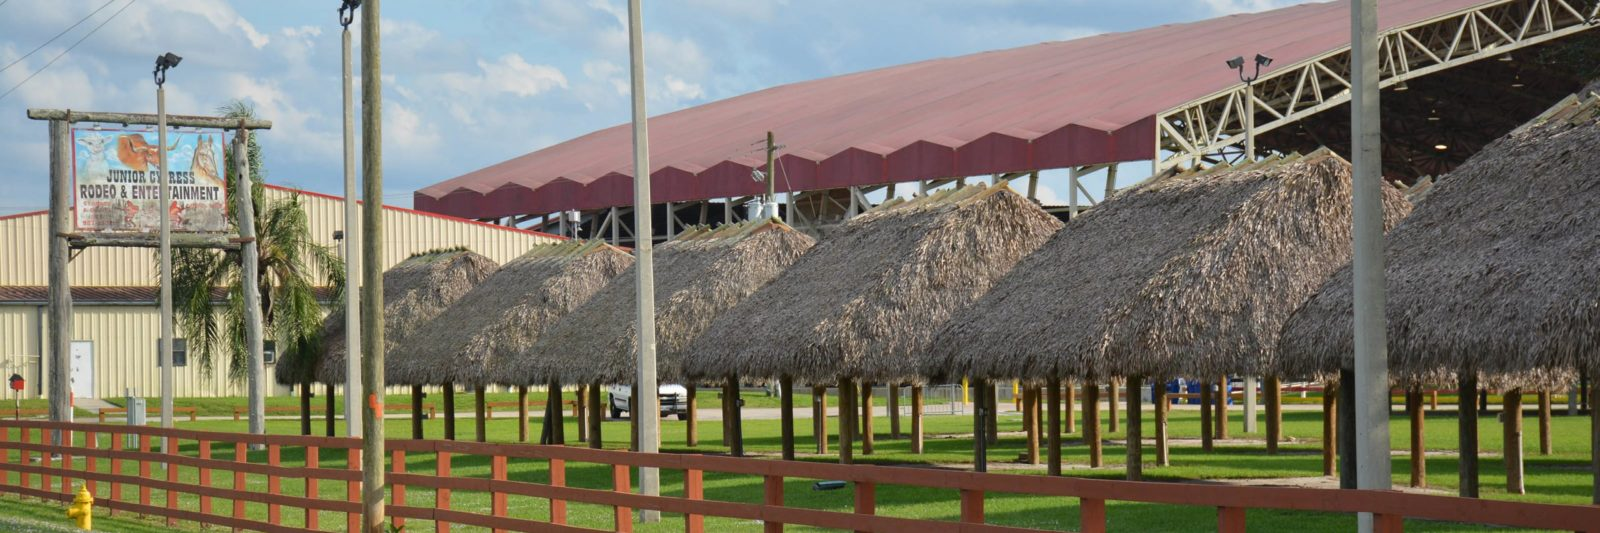 Big Cypress Seminole Rodeo Grounds